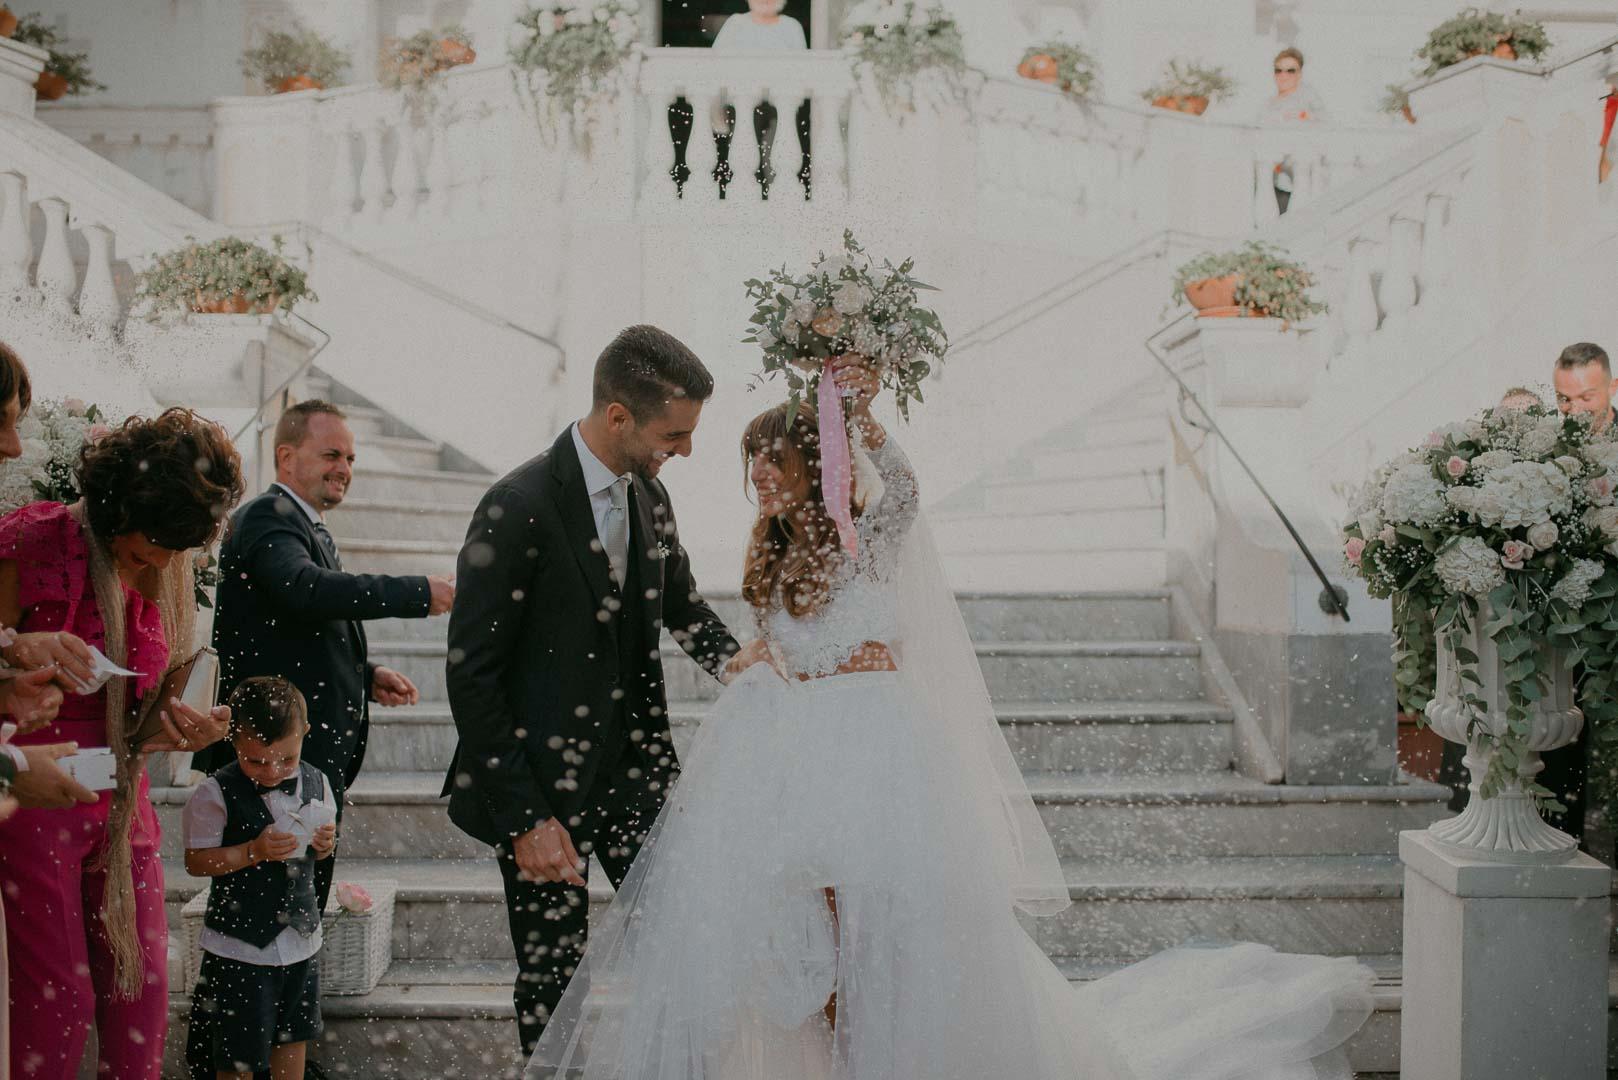 wedding-photographer-destination-fineart-bespoke-reportage-napoli-nabilah-vivianeizzo-spazio46-83